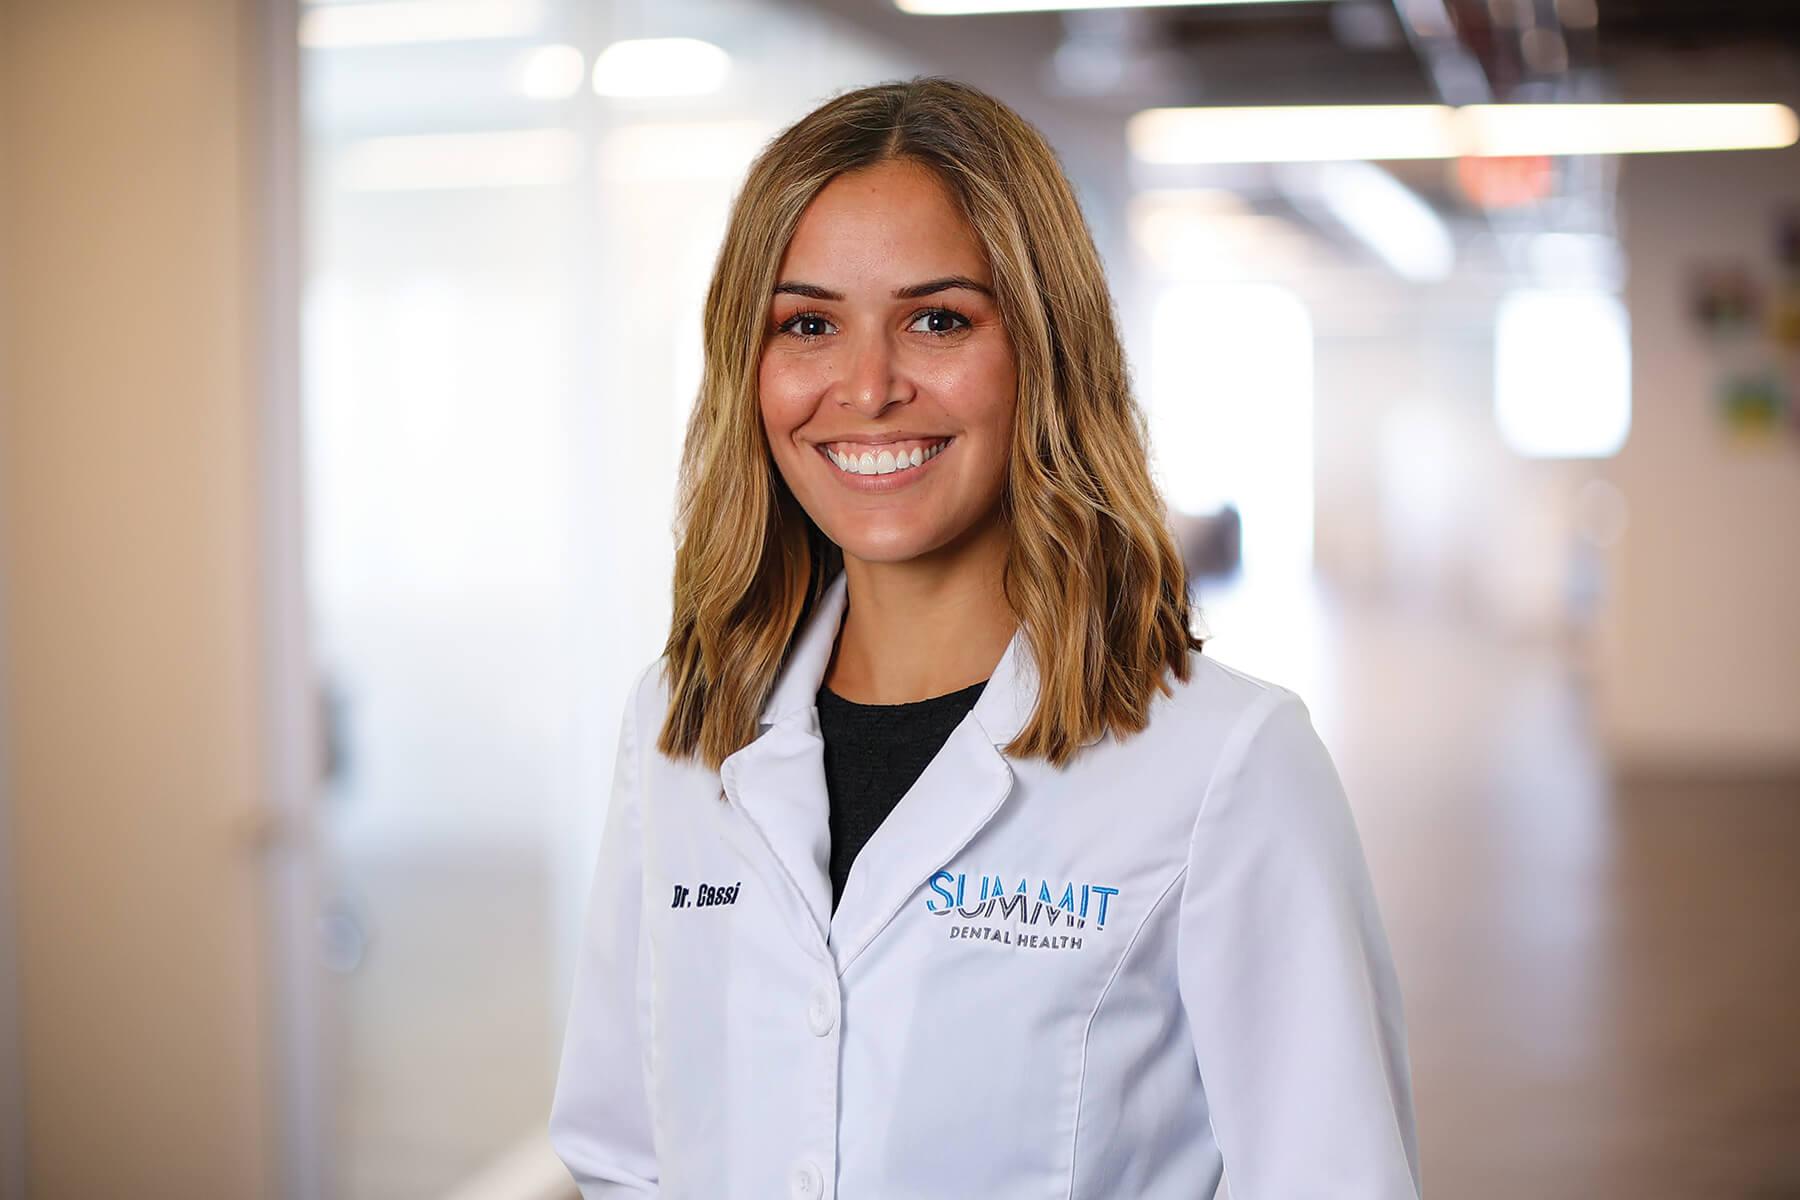 Dr. Cassi McCarthy